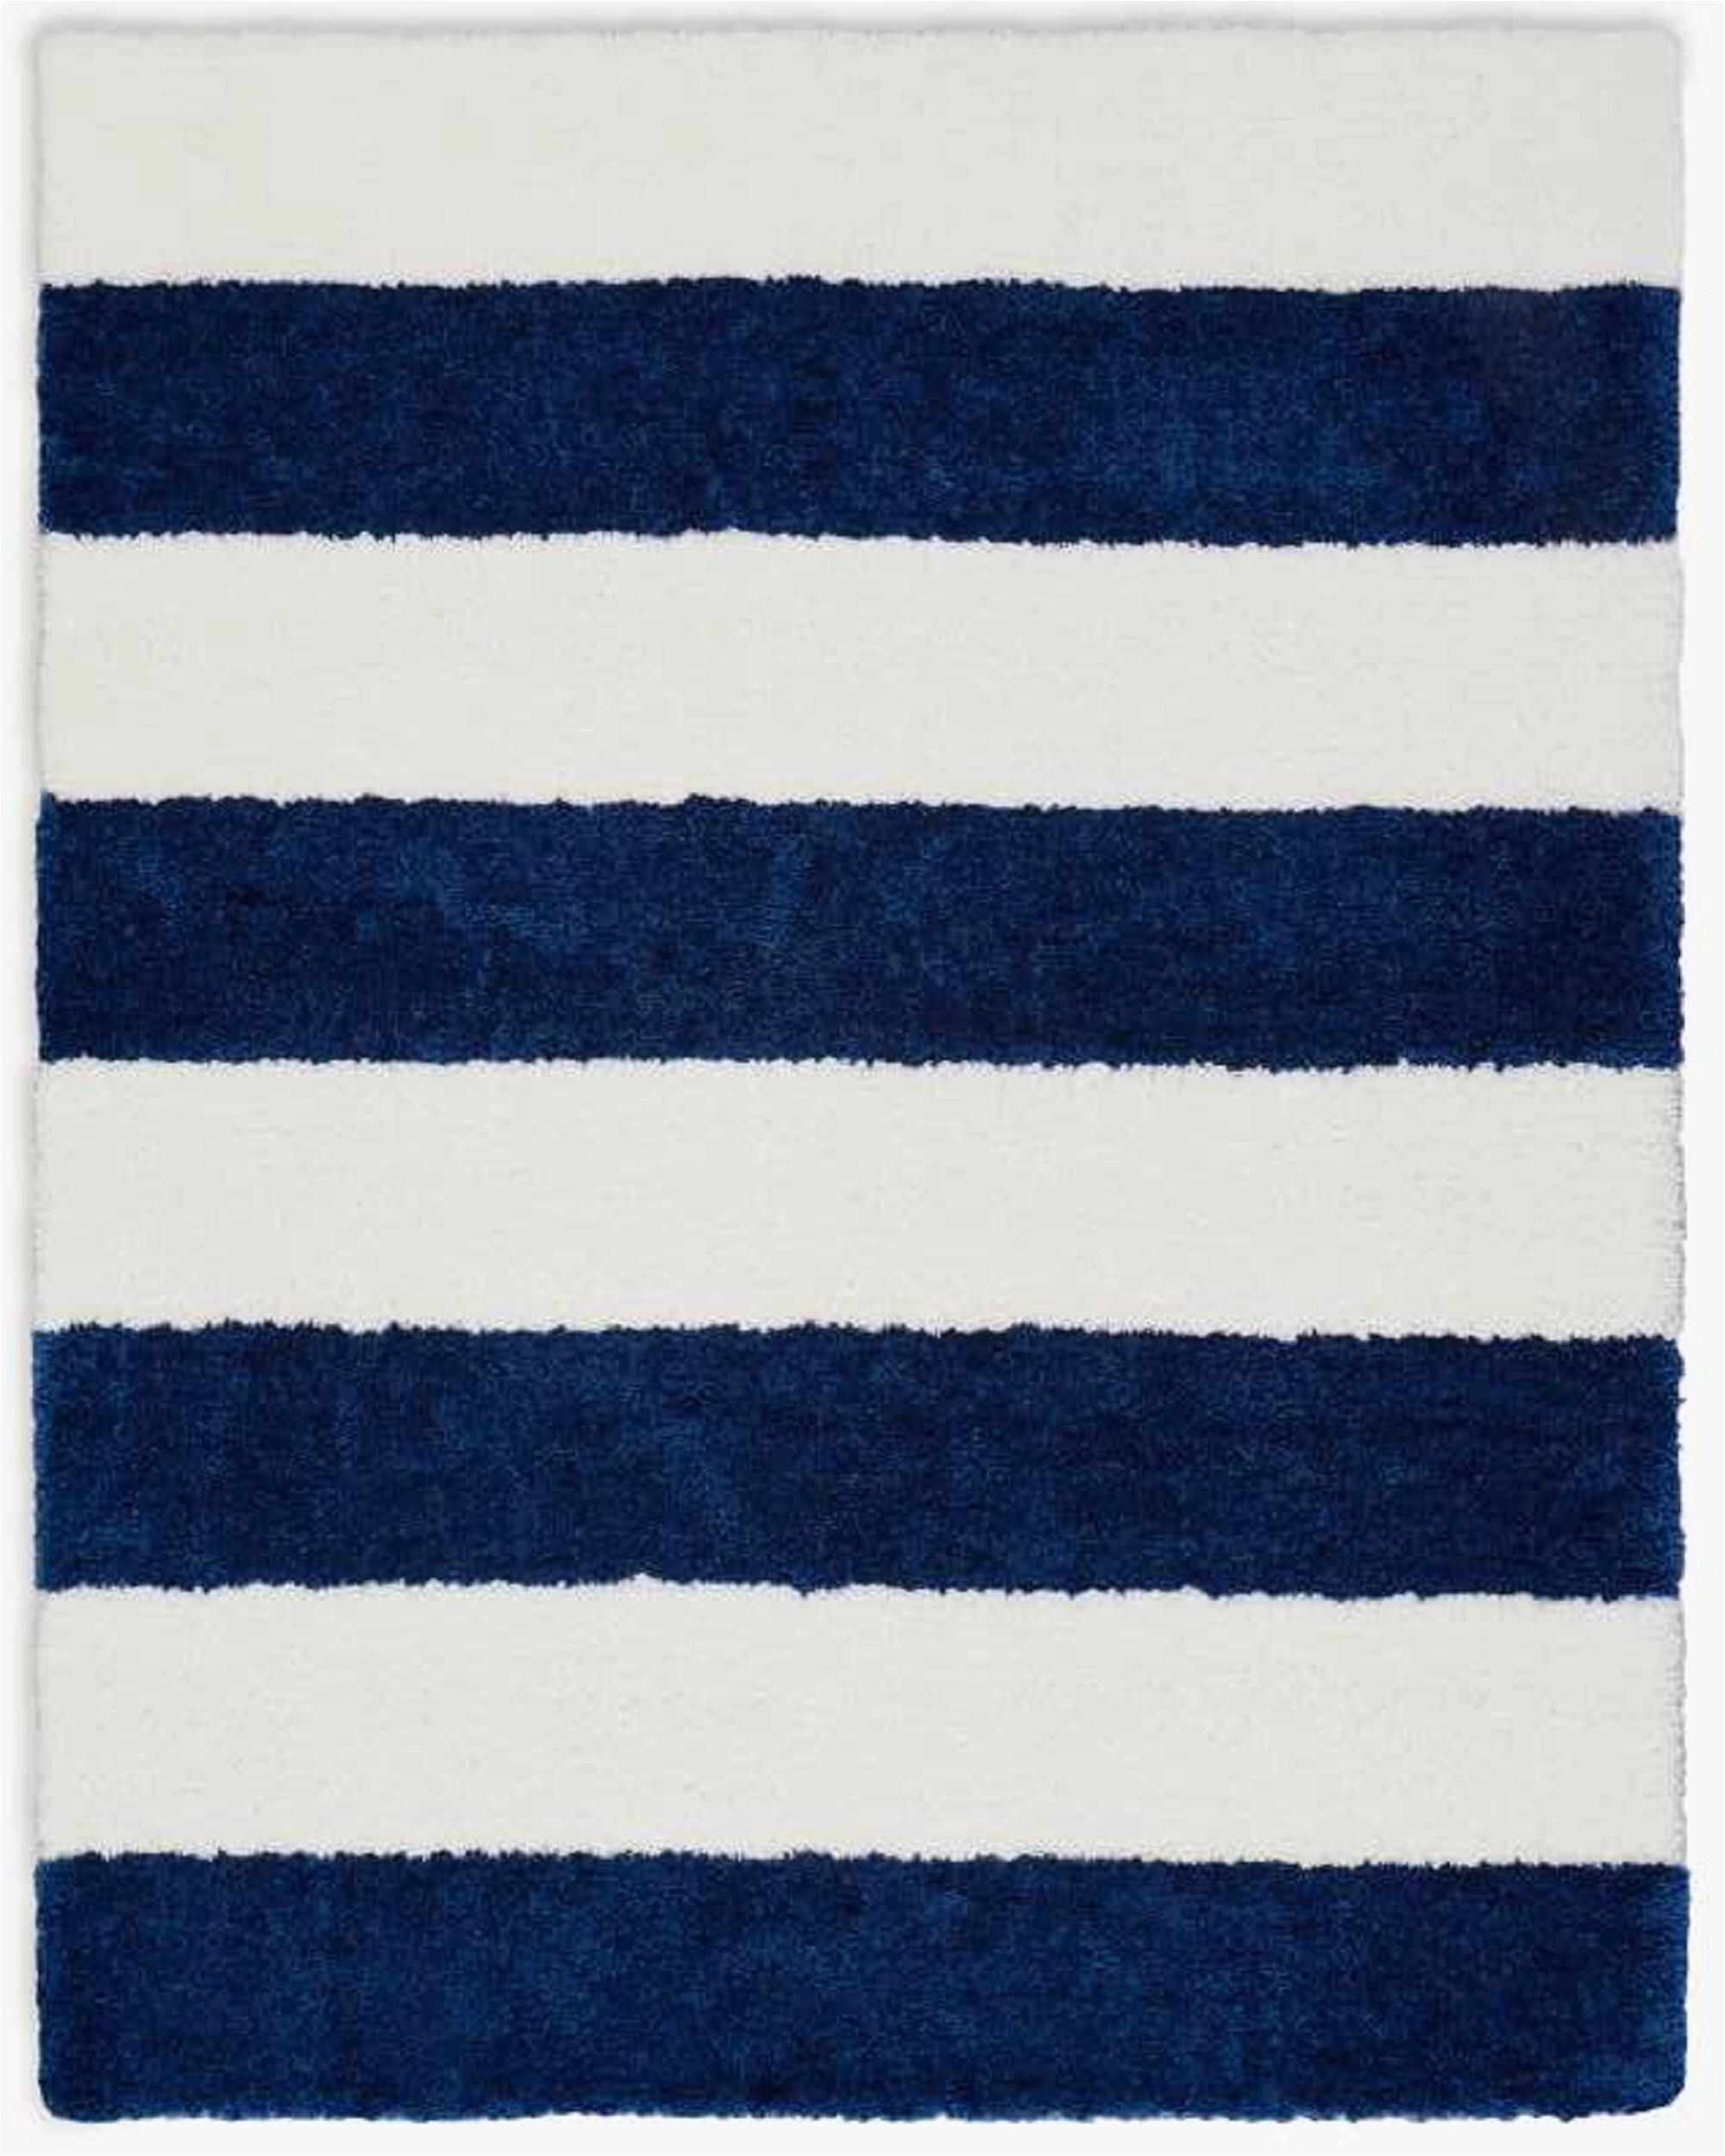 chicago striped handmade shag whitenavy blue area rug